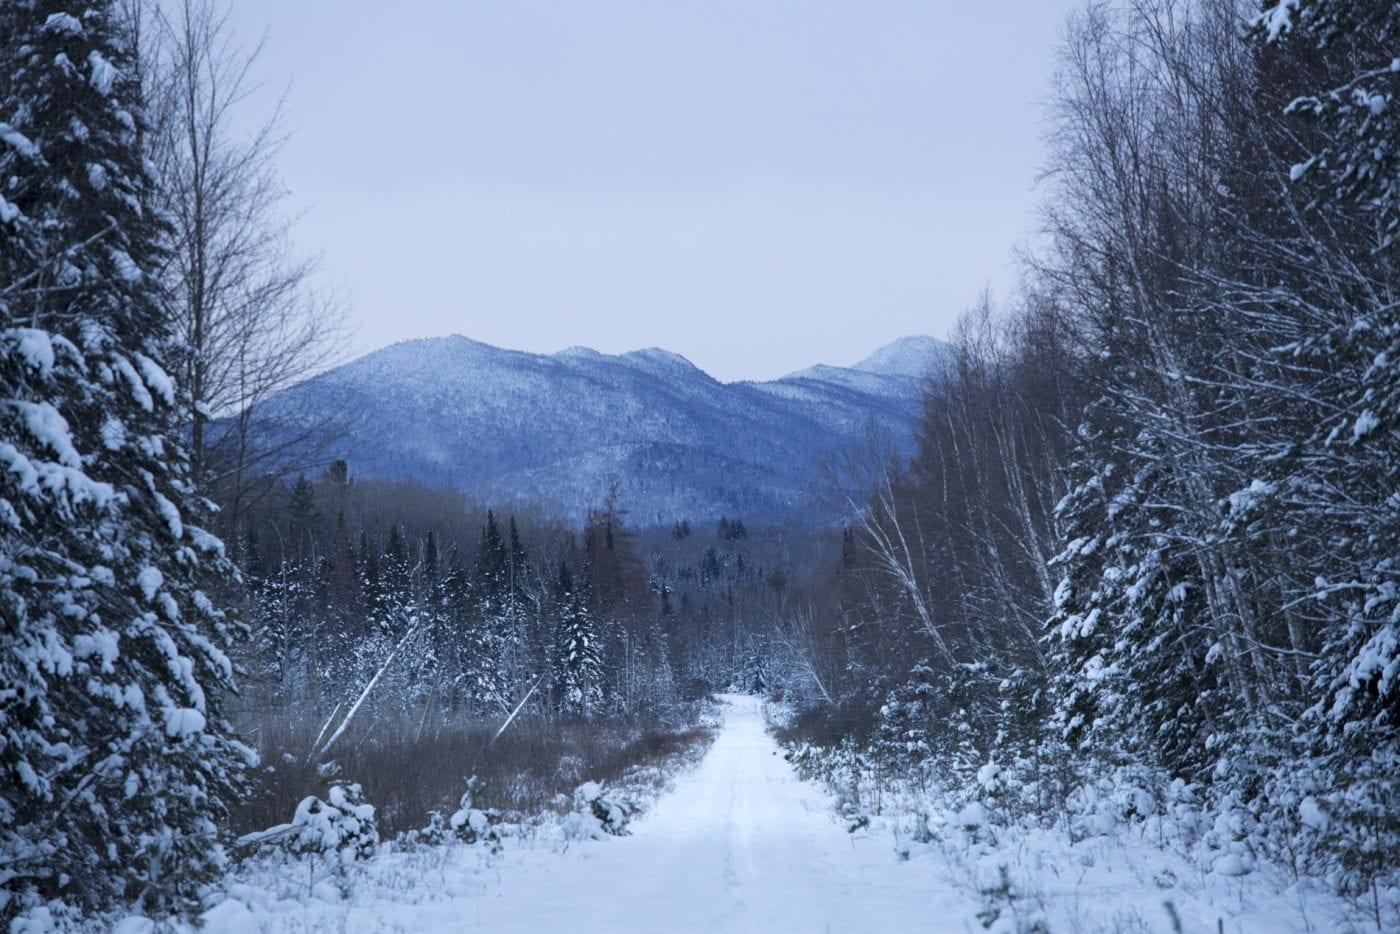 Snowy-Peaks-Adirondacks-Mike-Lynch